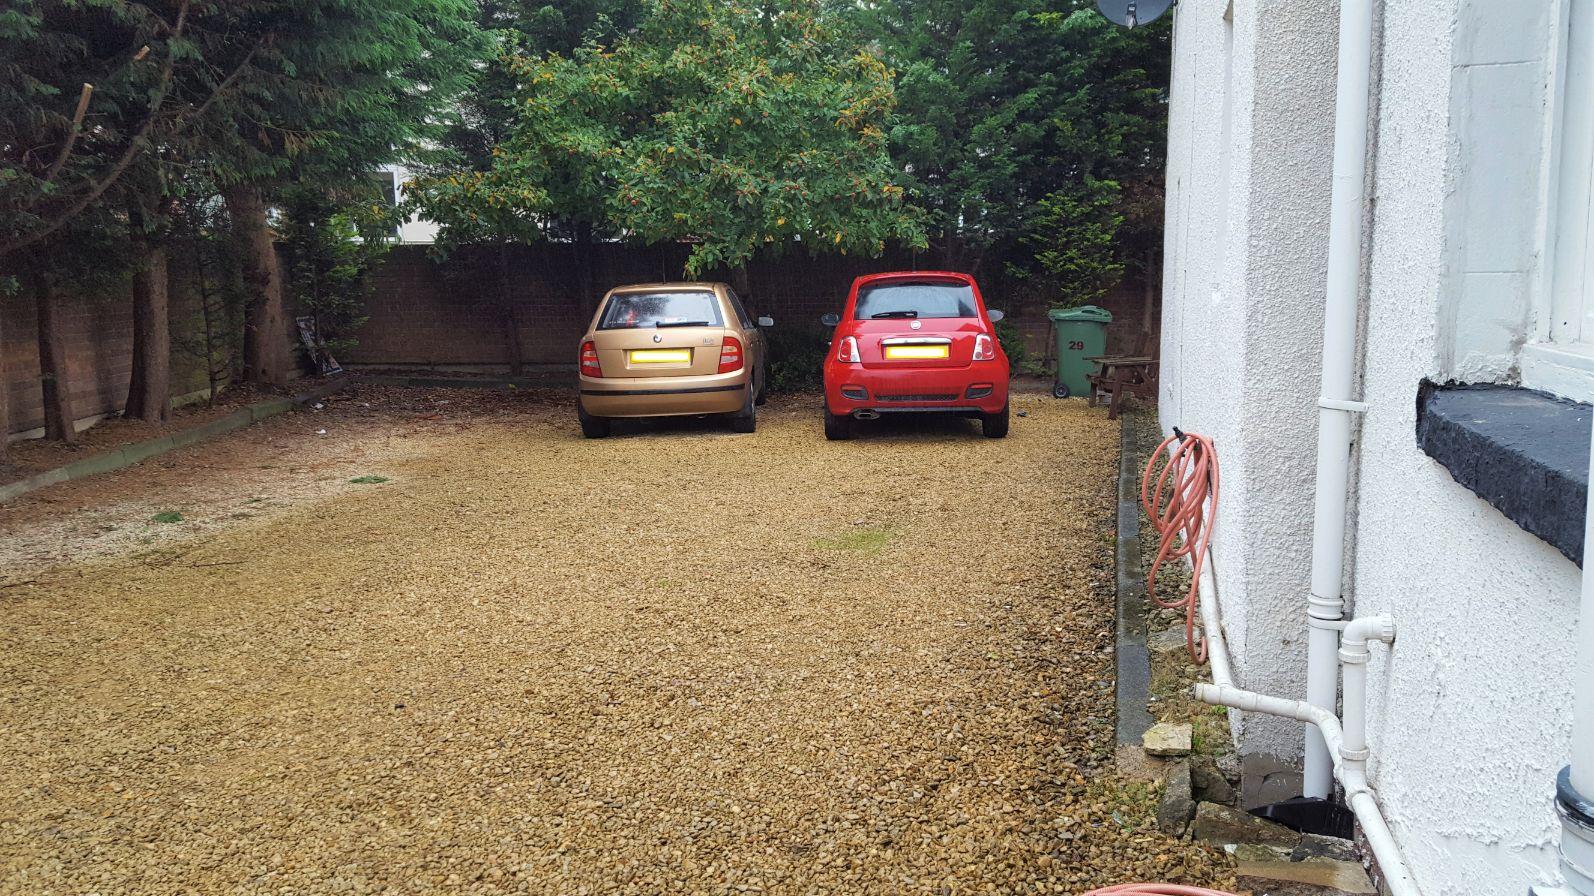 29 Oxford Street - parking